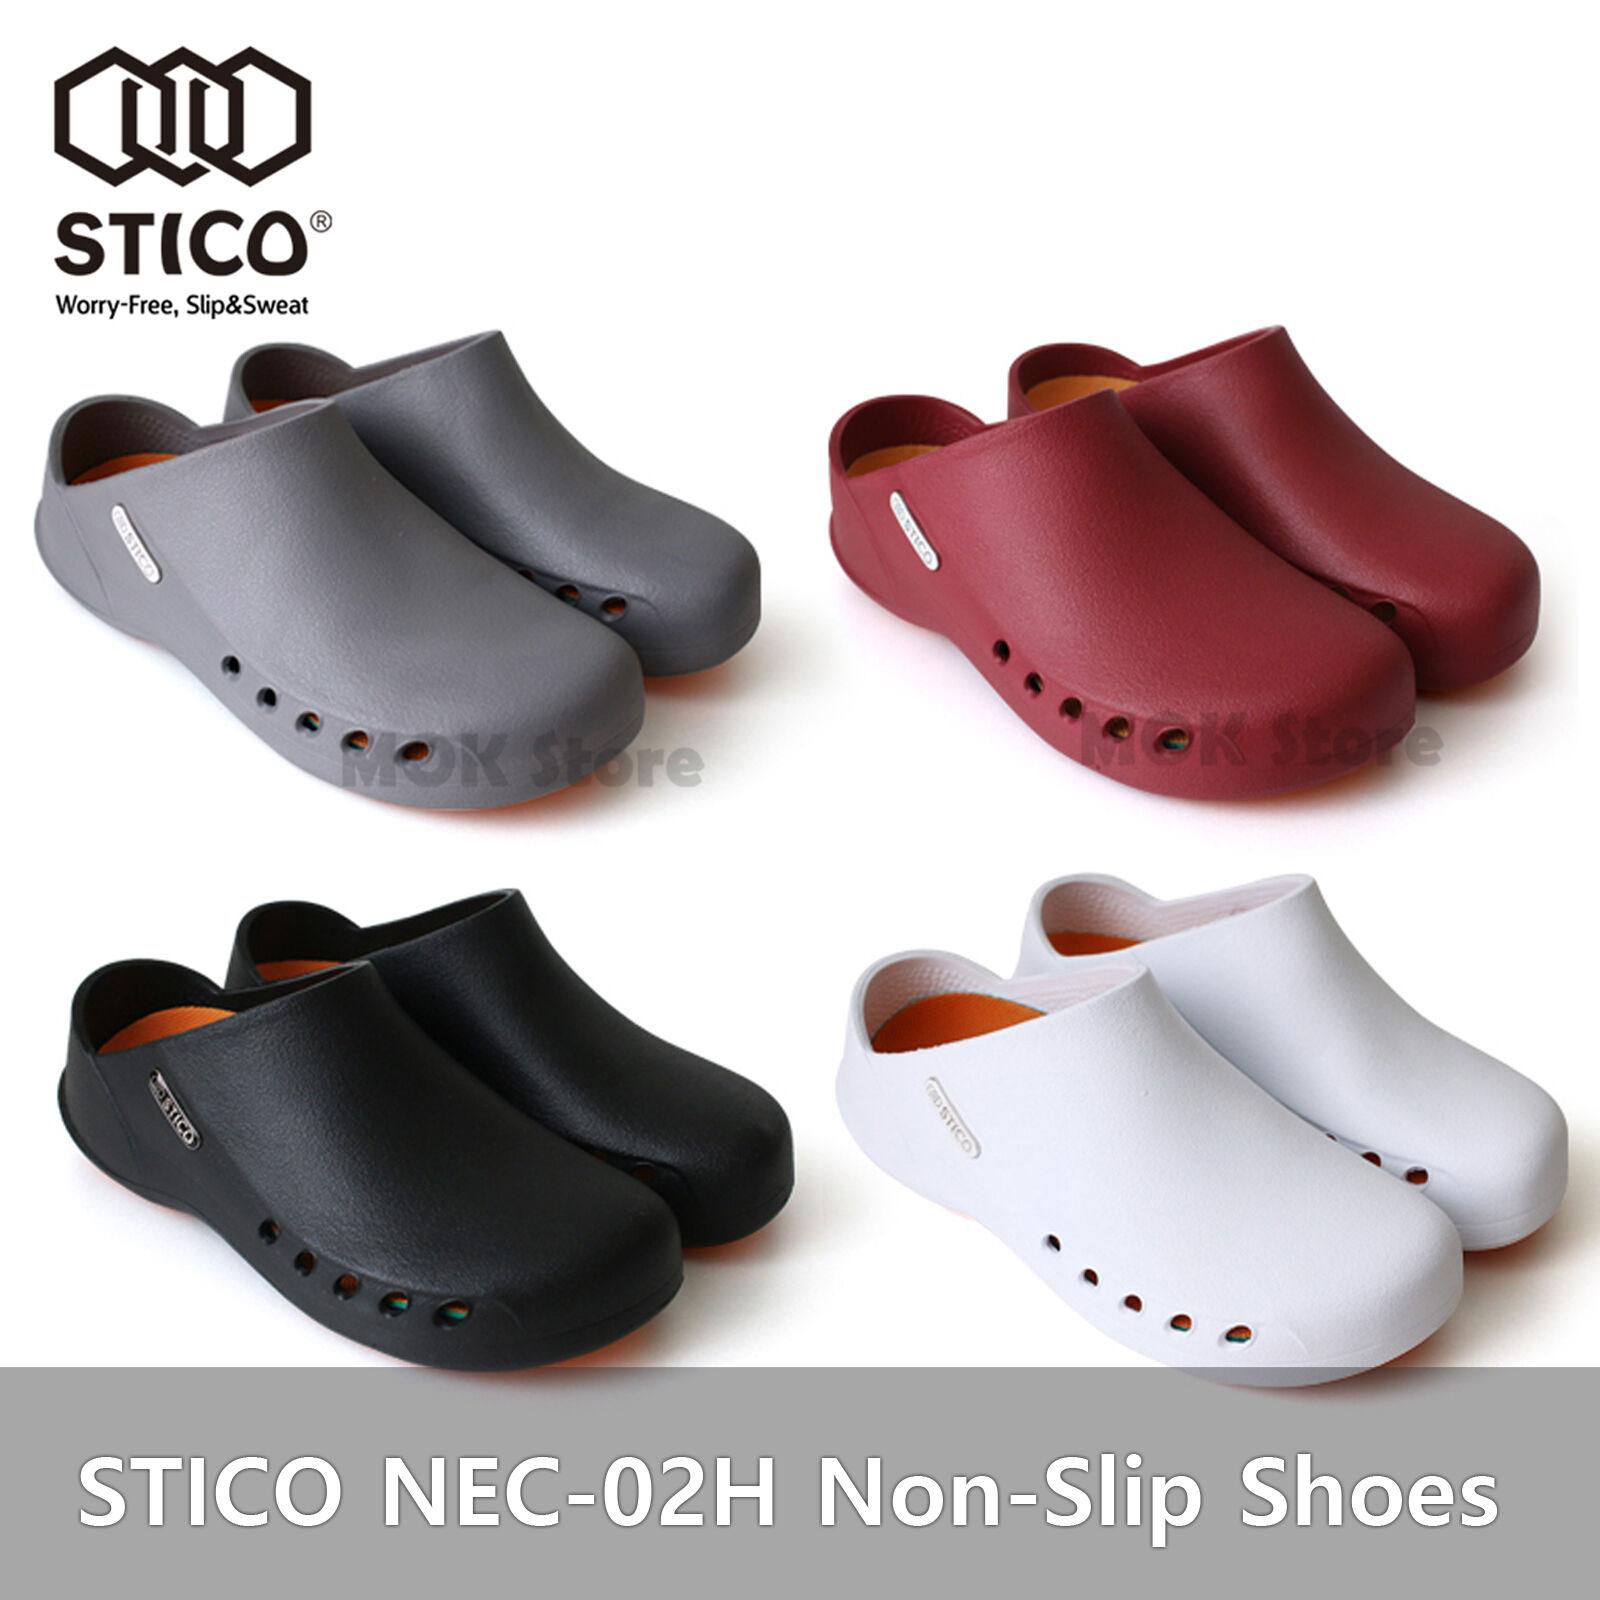 STICO NEC-02H Women Chef Kitchen Shoes Non-Slip Cook Slipper Indoor Clean Rubber